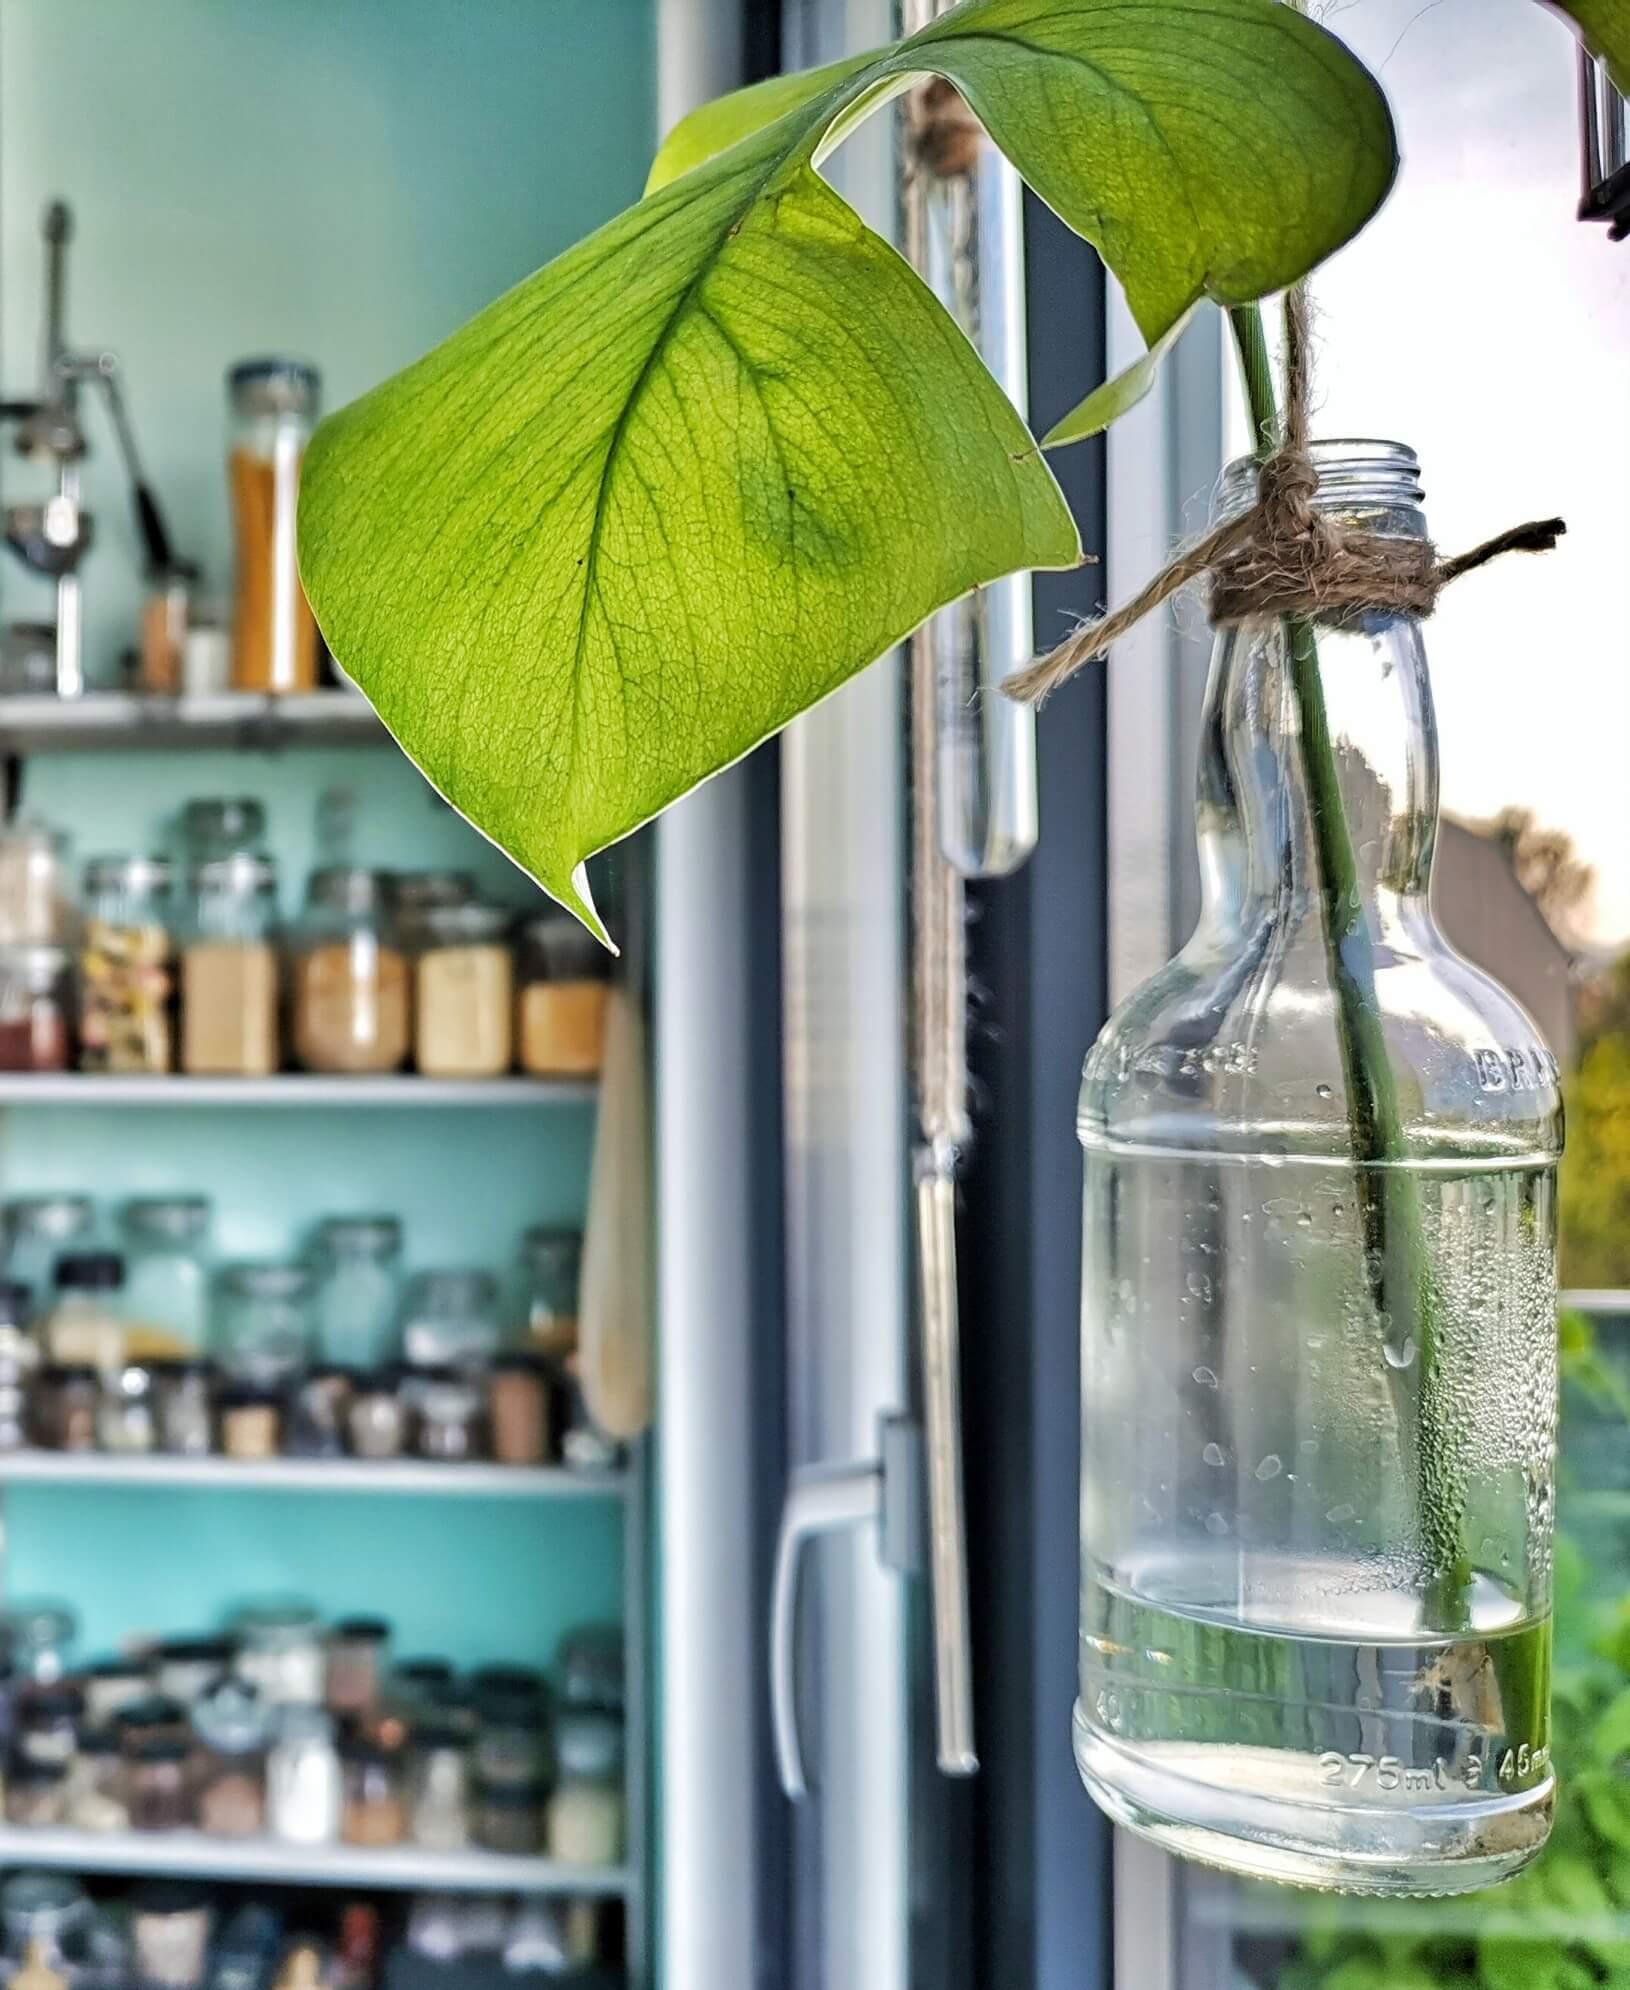 IMG 20190507 064516 577 resized 20190509 080423312 - Botanische Fensterdekoration: Herbarium statt Gardinen